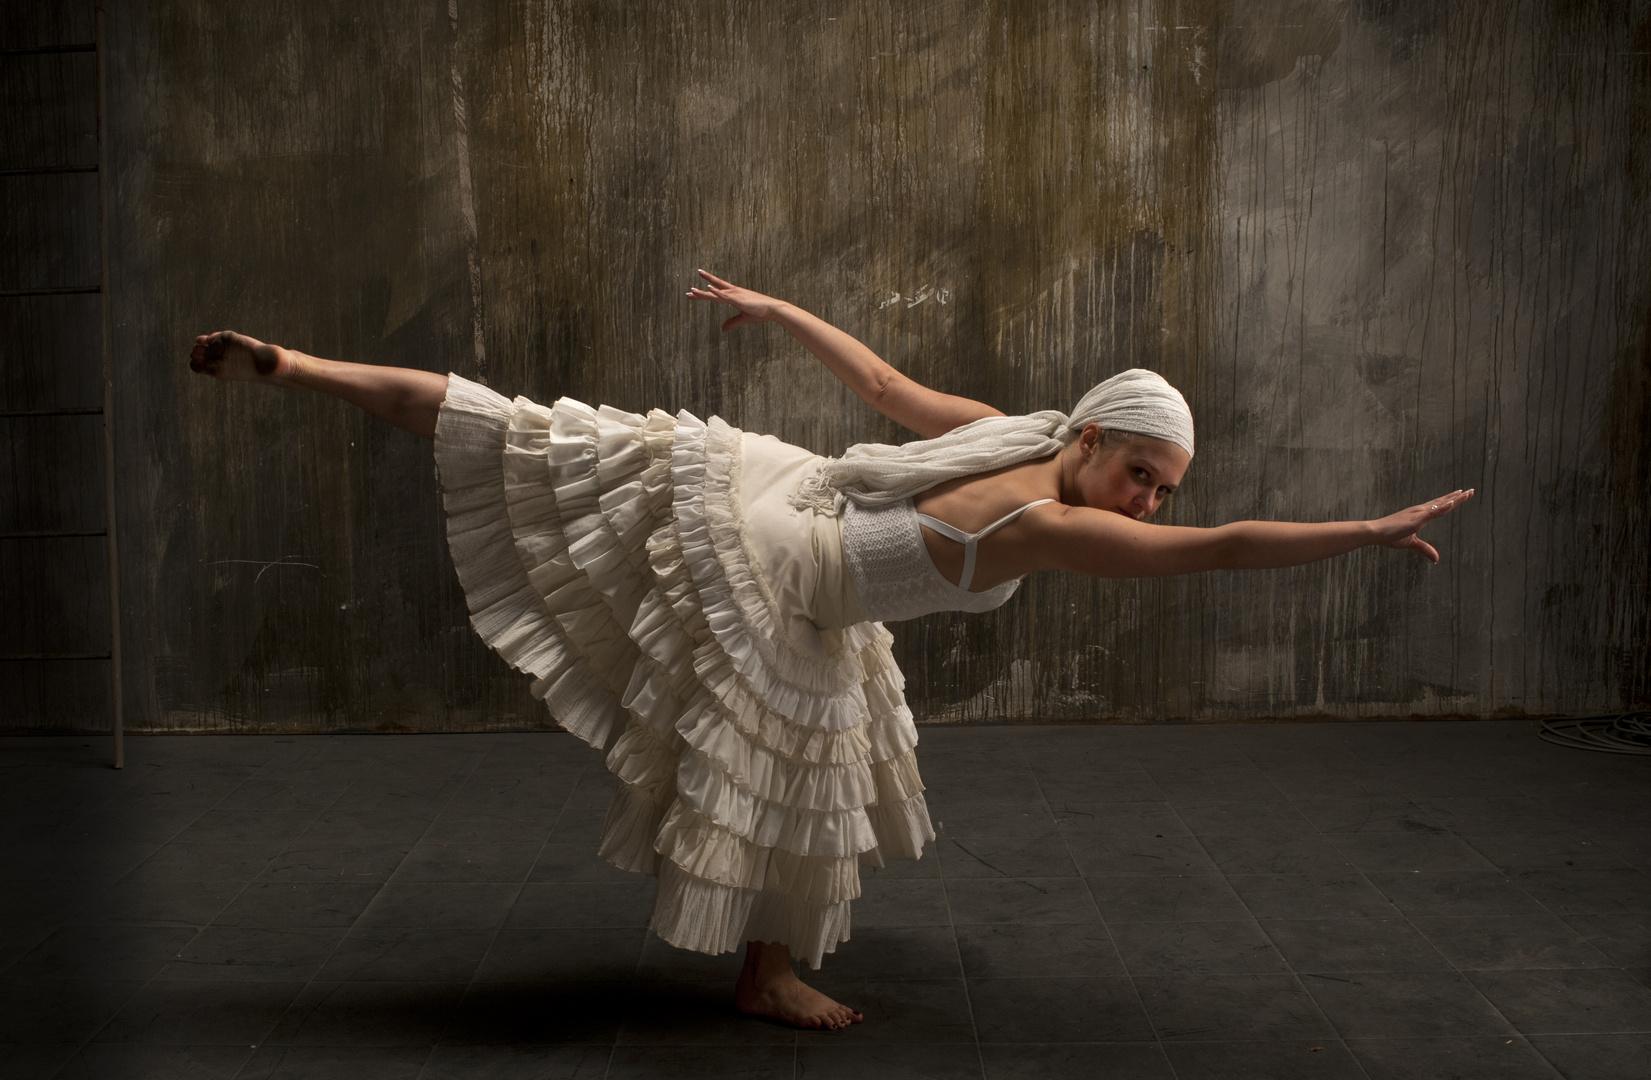 dirty ballerina